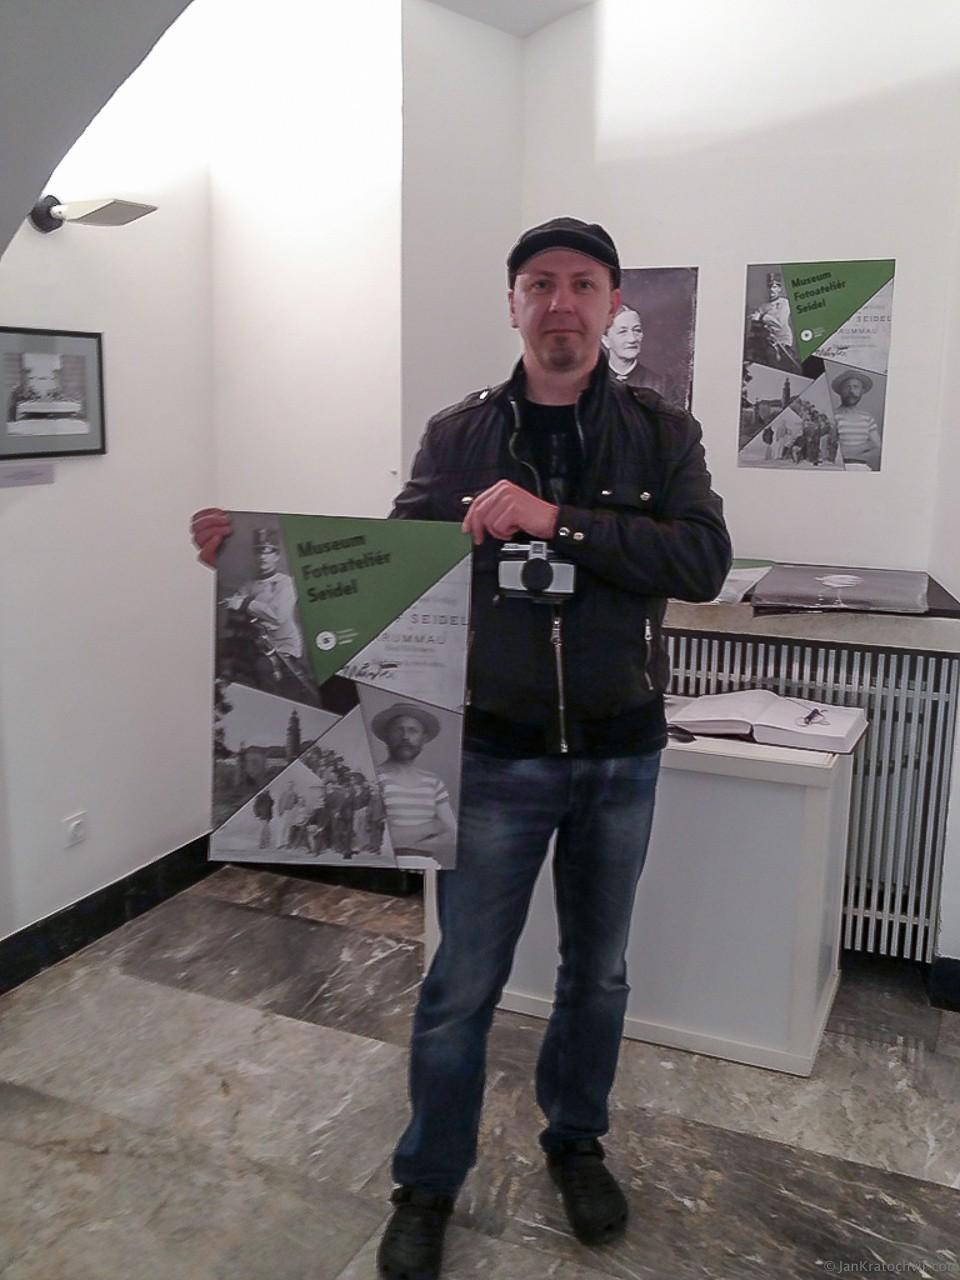 seidel-cesky-krumlov-vystava-celje-slovinsko-kolodium-collodion-wetplate-jan-kratochvil_4-2